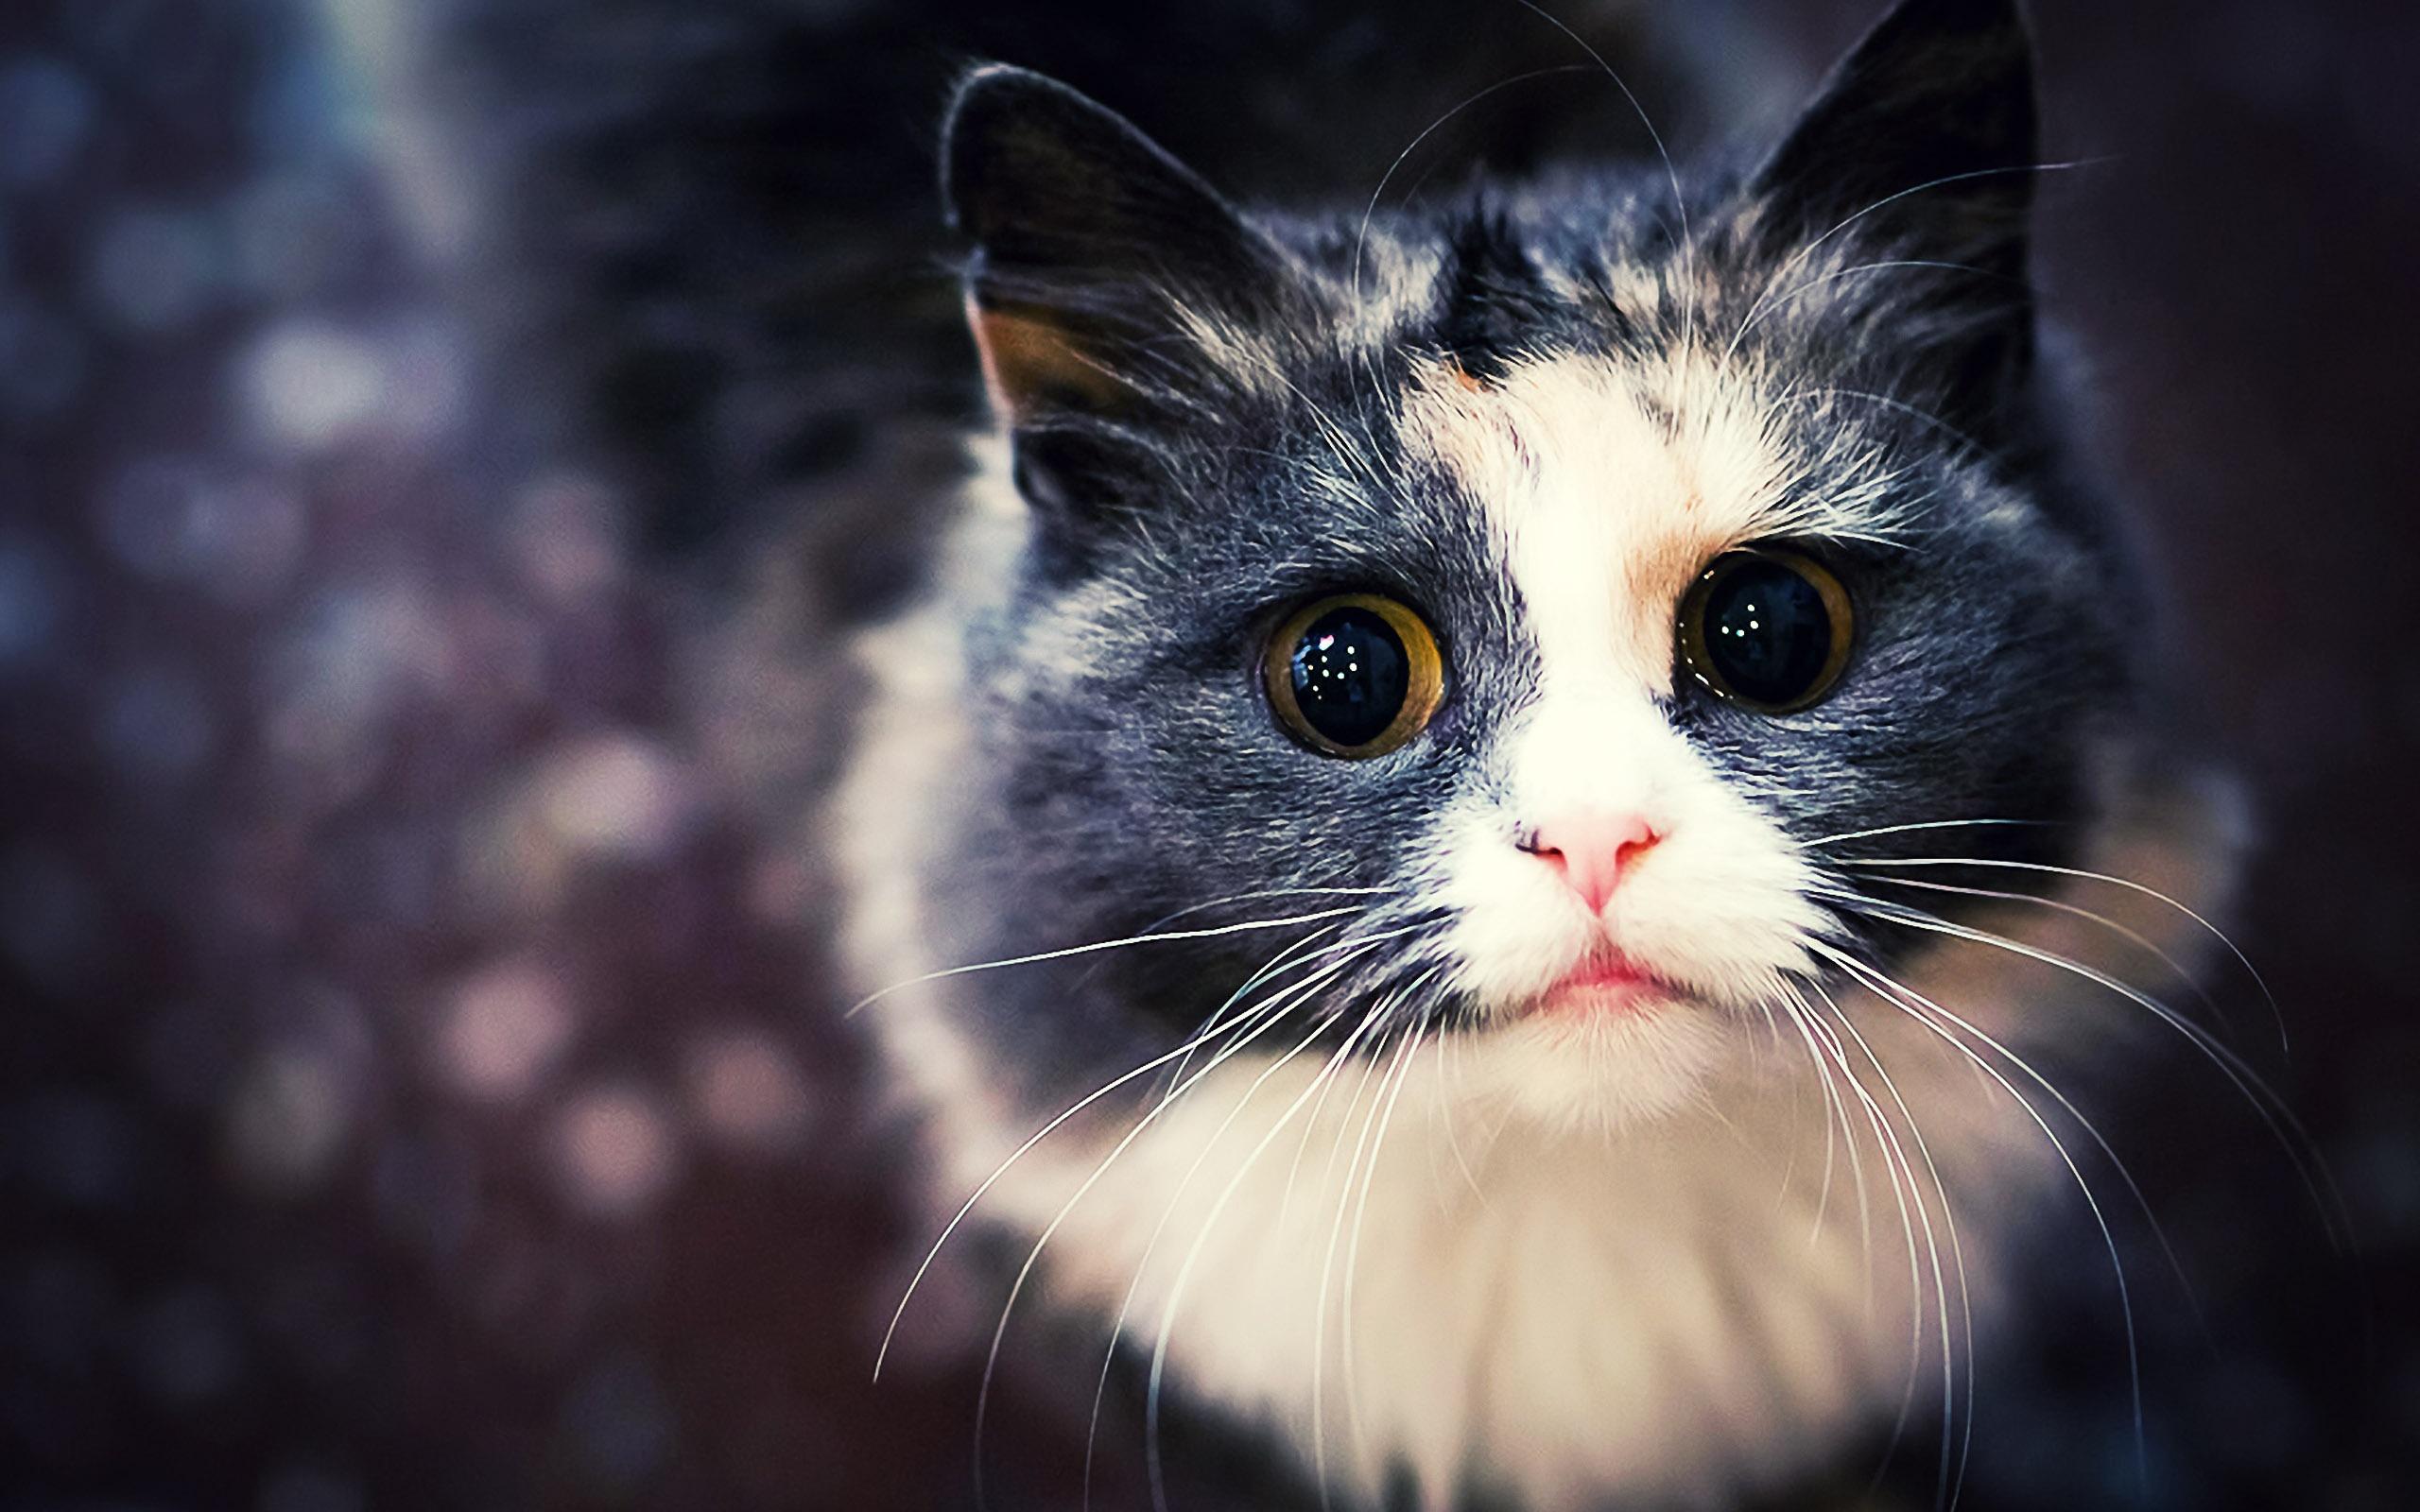 Cats Wallpaper Desktop h765242 Animals HD Wallpaper 2560x1600